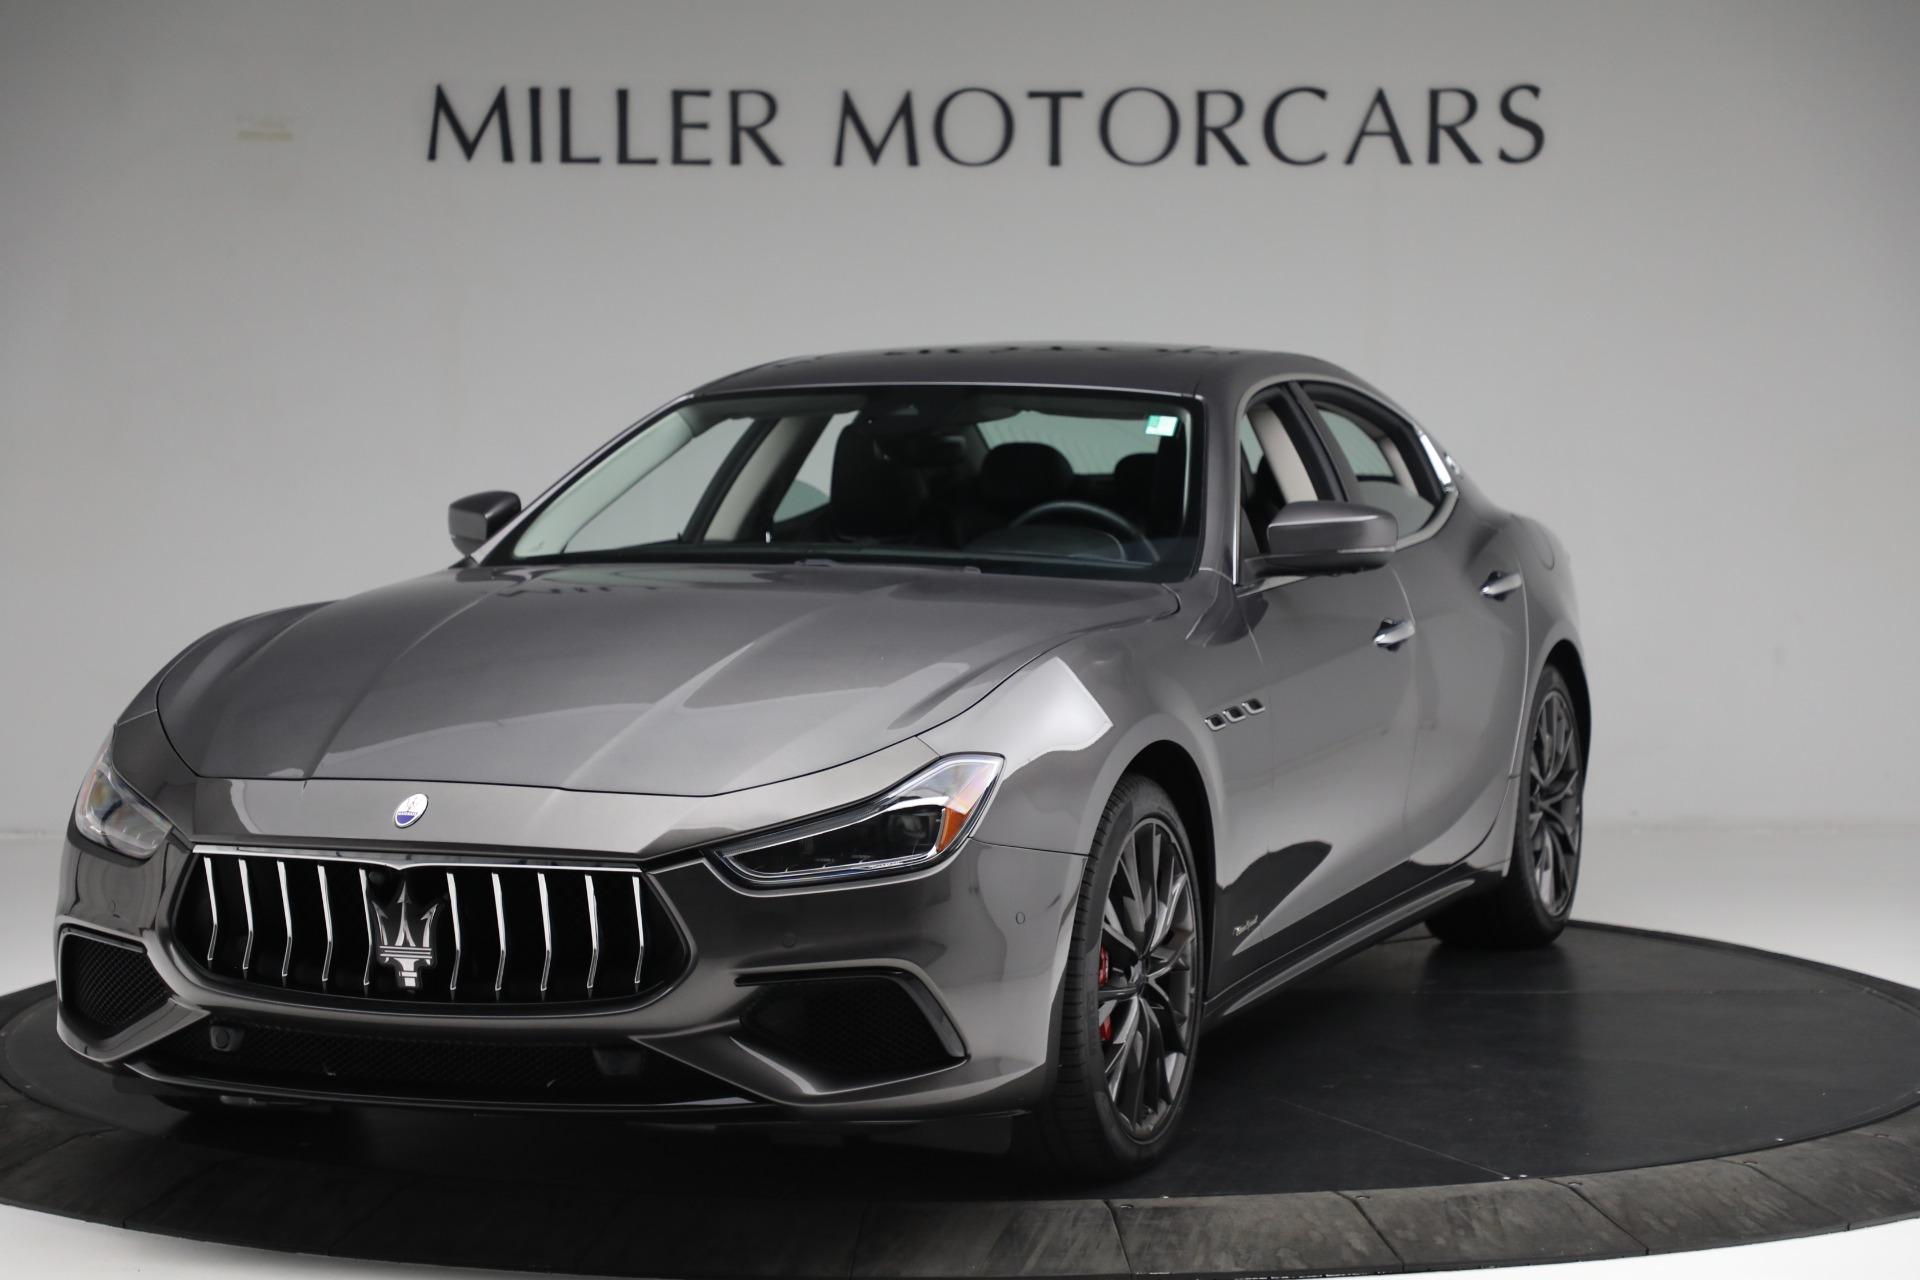 New 2019 Maserati Ghibli S Q4 GranSport For Sale In Greenwich, CT 3493_main